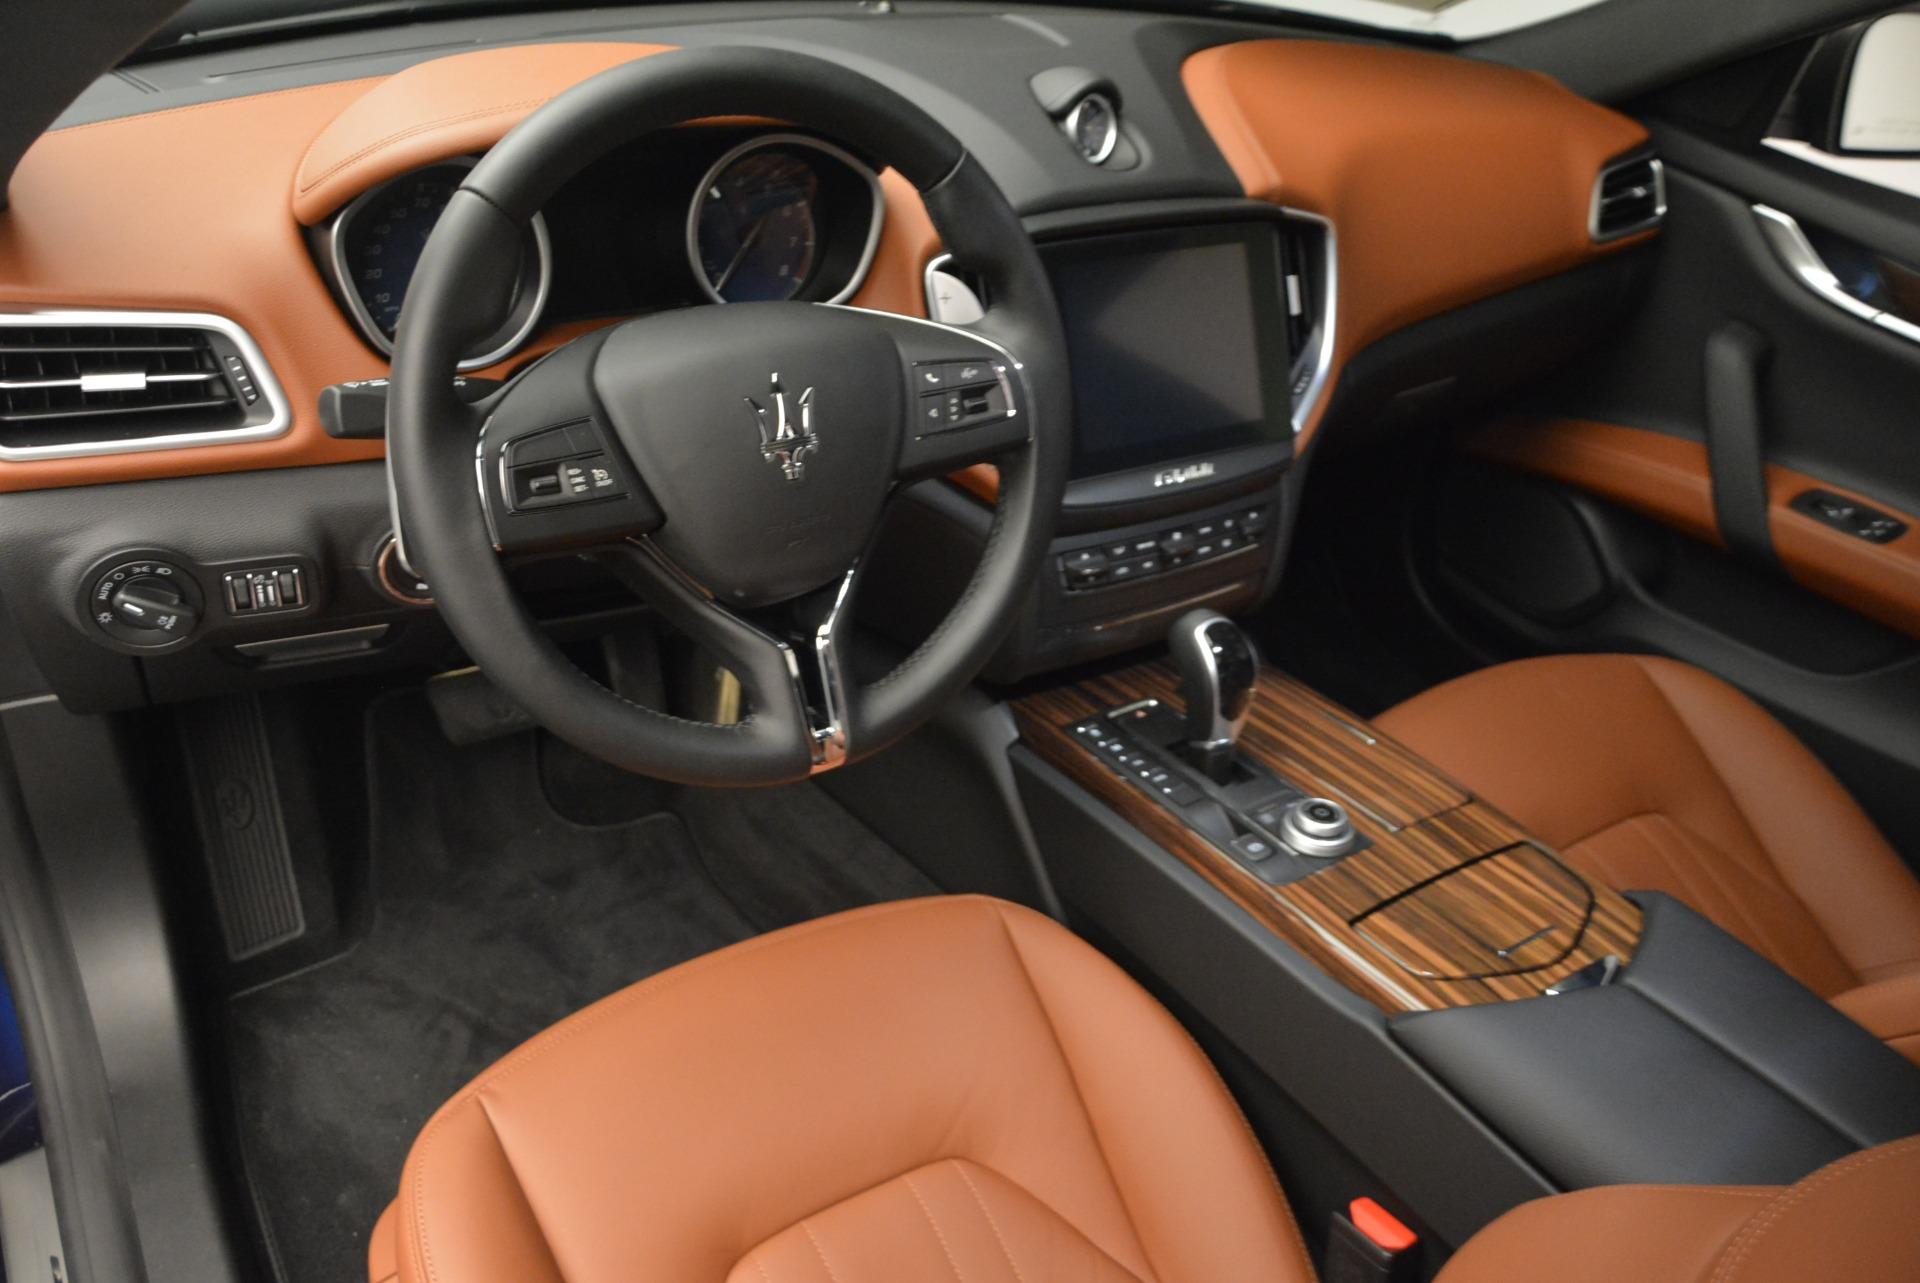 Used 2017 Maserati Ghibli S Q4 EX-LOANER For Sale In Greenwich, CT 608_p16